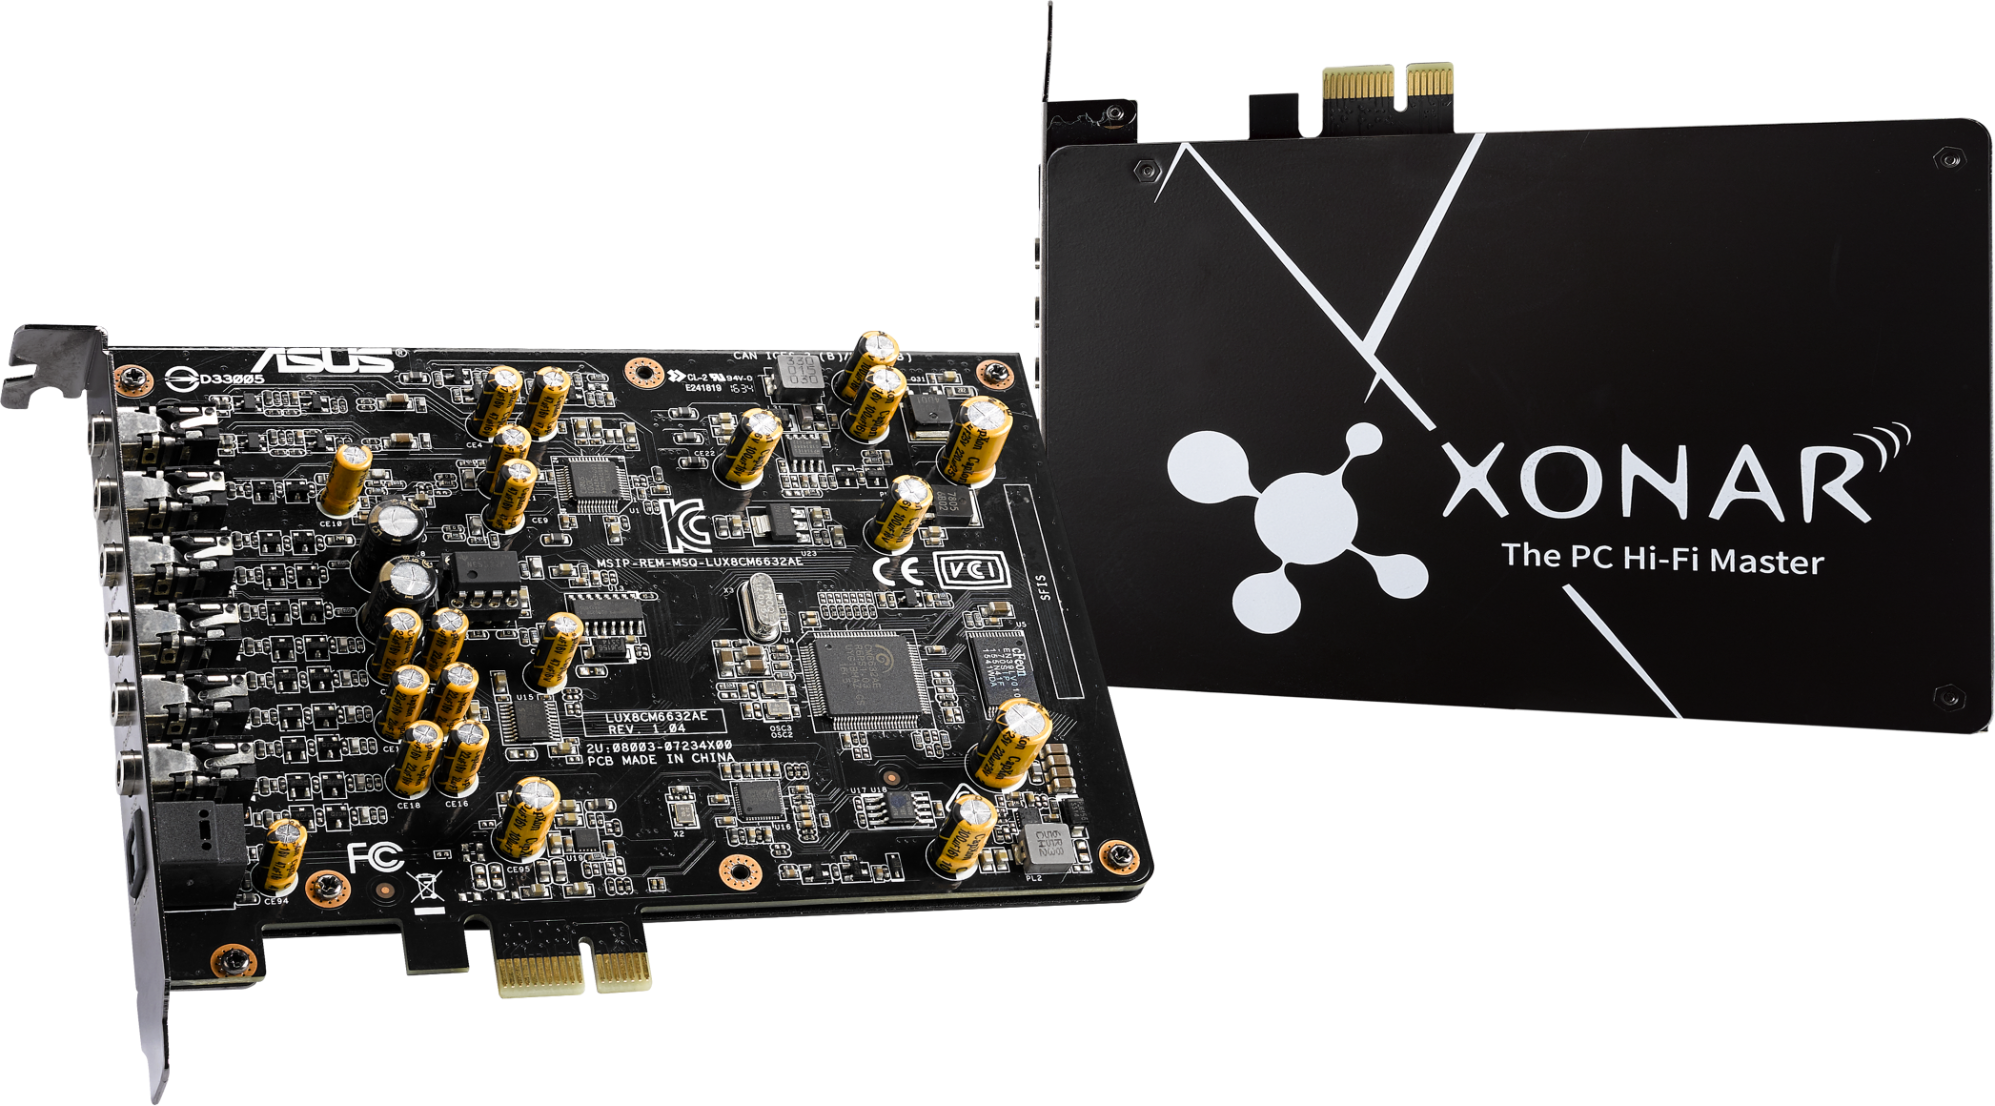 Звукова карта ASUS Xonar AE 7.1 PCIe Gaming audio